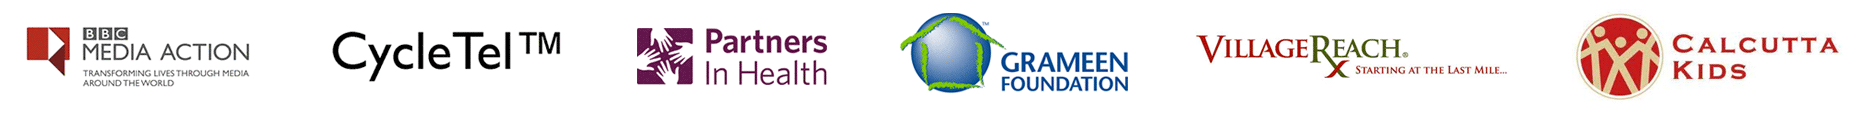 Partner Companies Logos